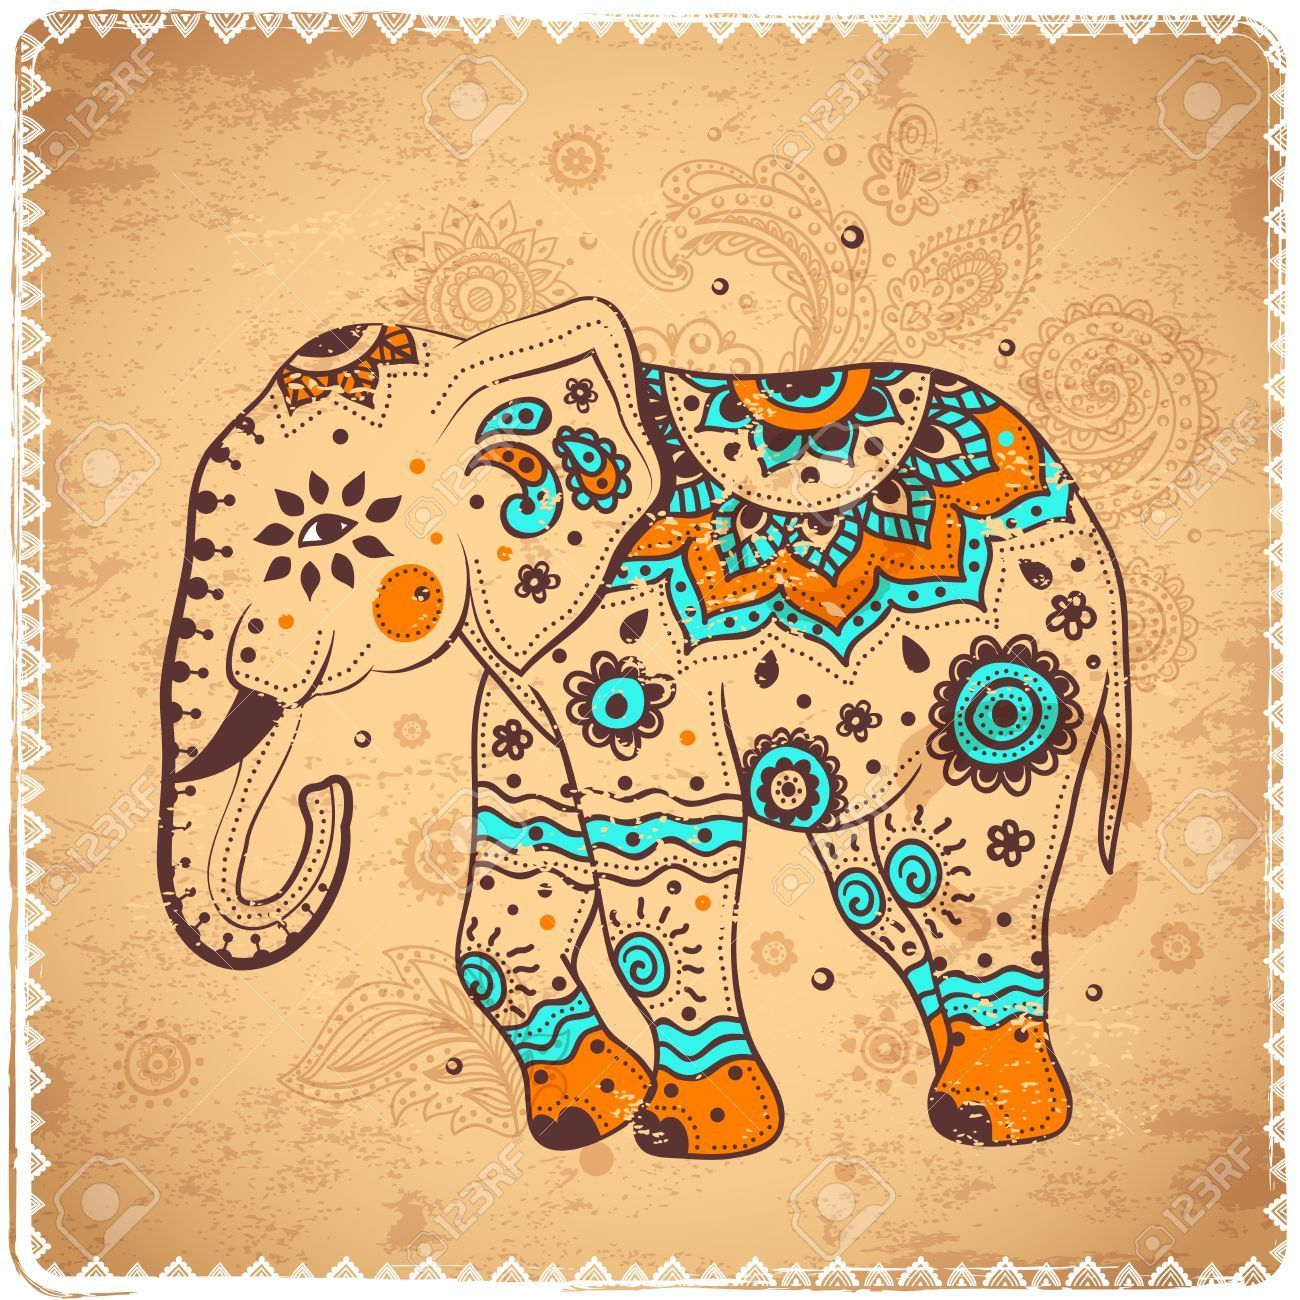 Image Result For Elefante Indio Dibujo Elephant Illustration Elephant Art Vintage Elephant